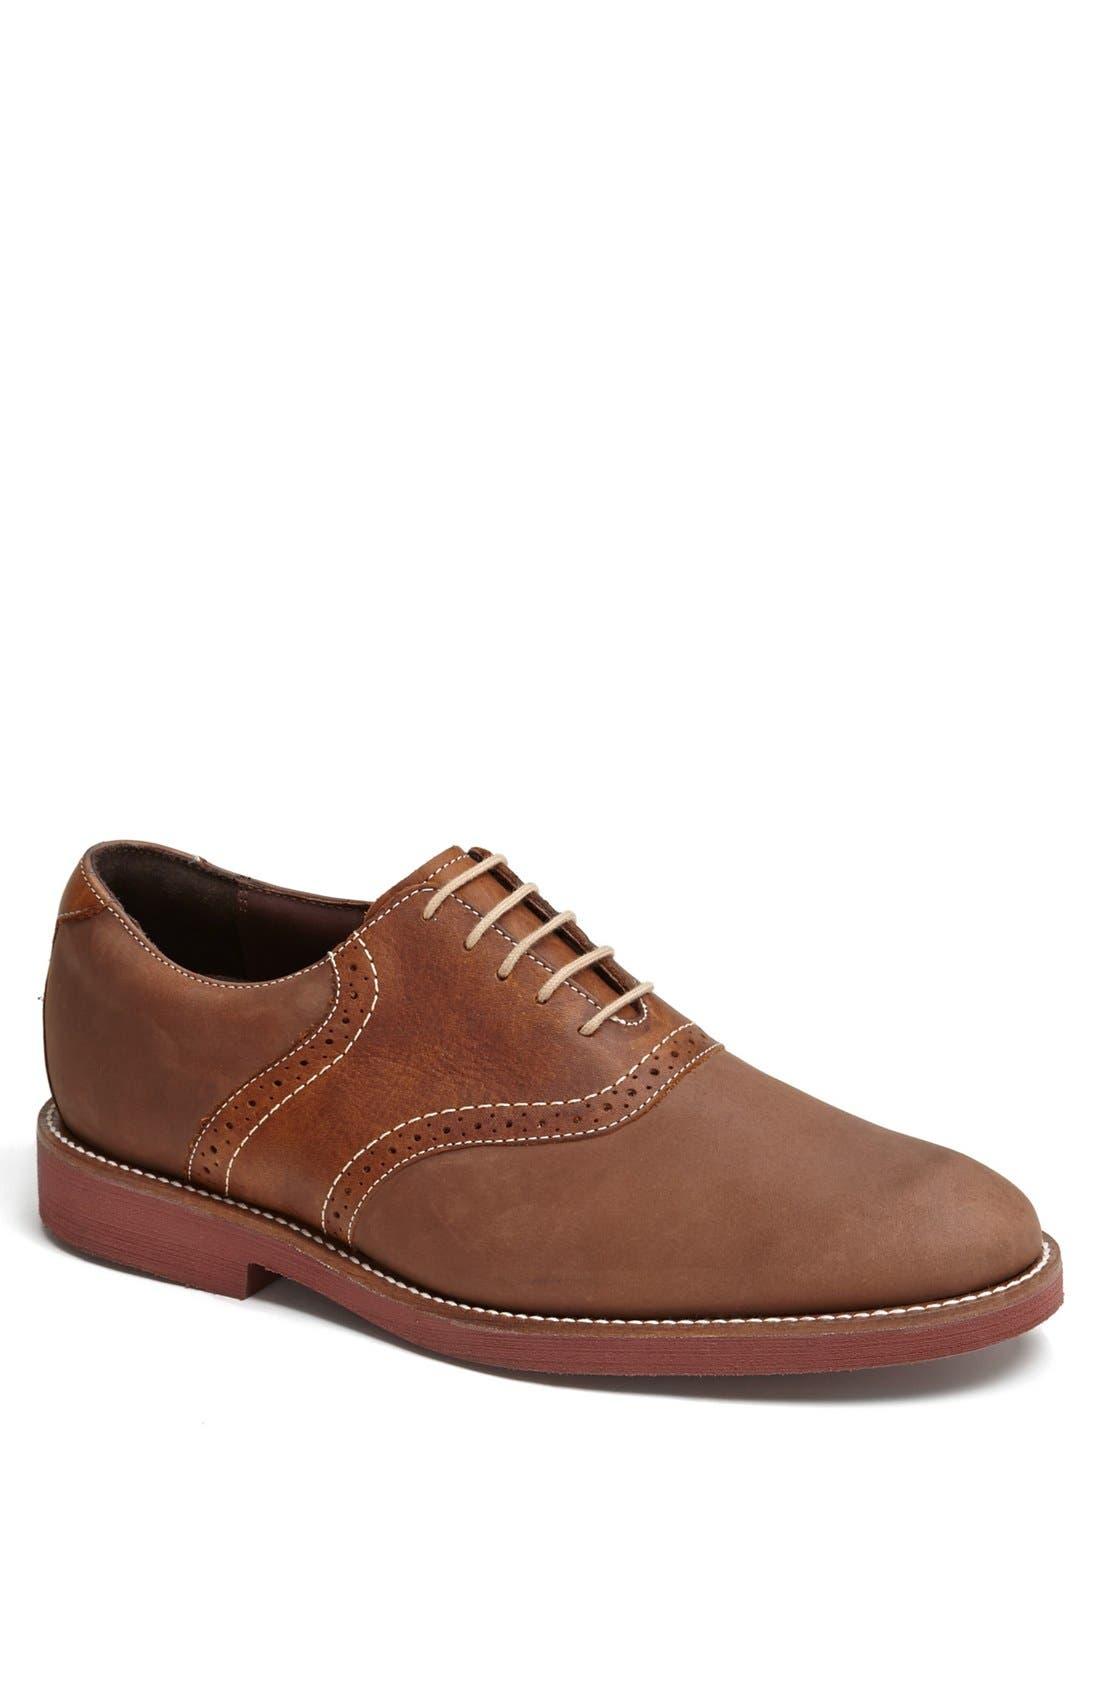 Neil M 'Stanford' Saddle Shoe